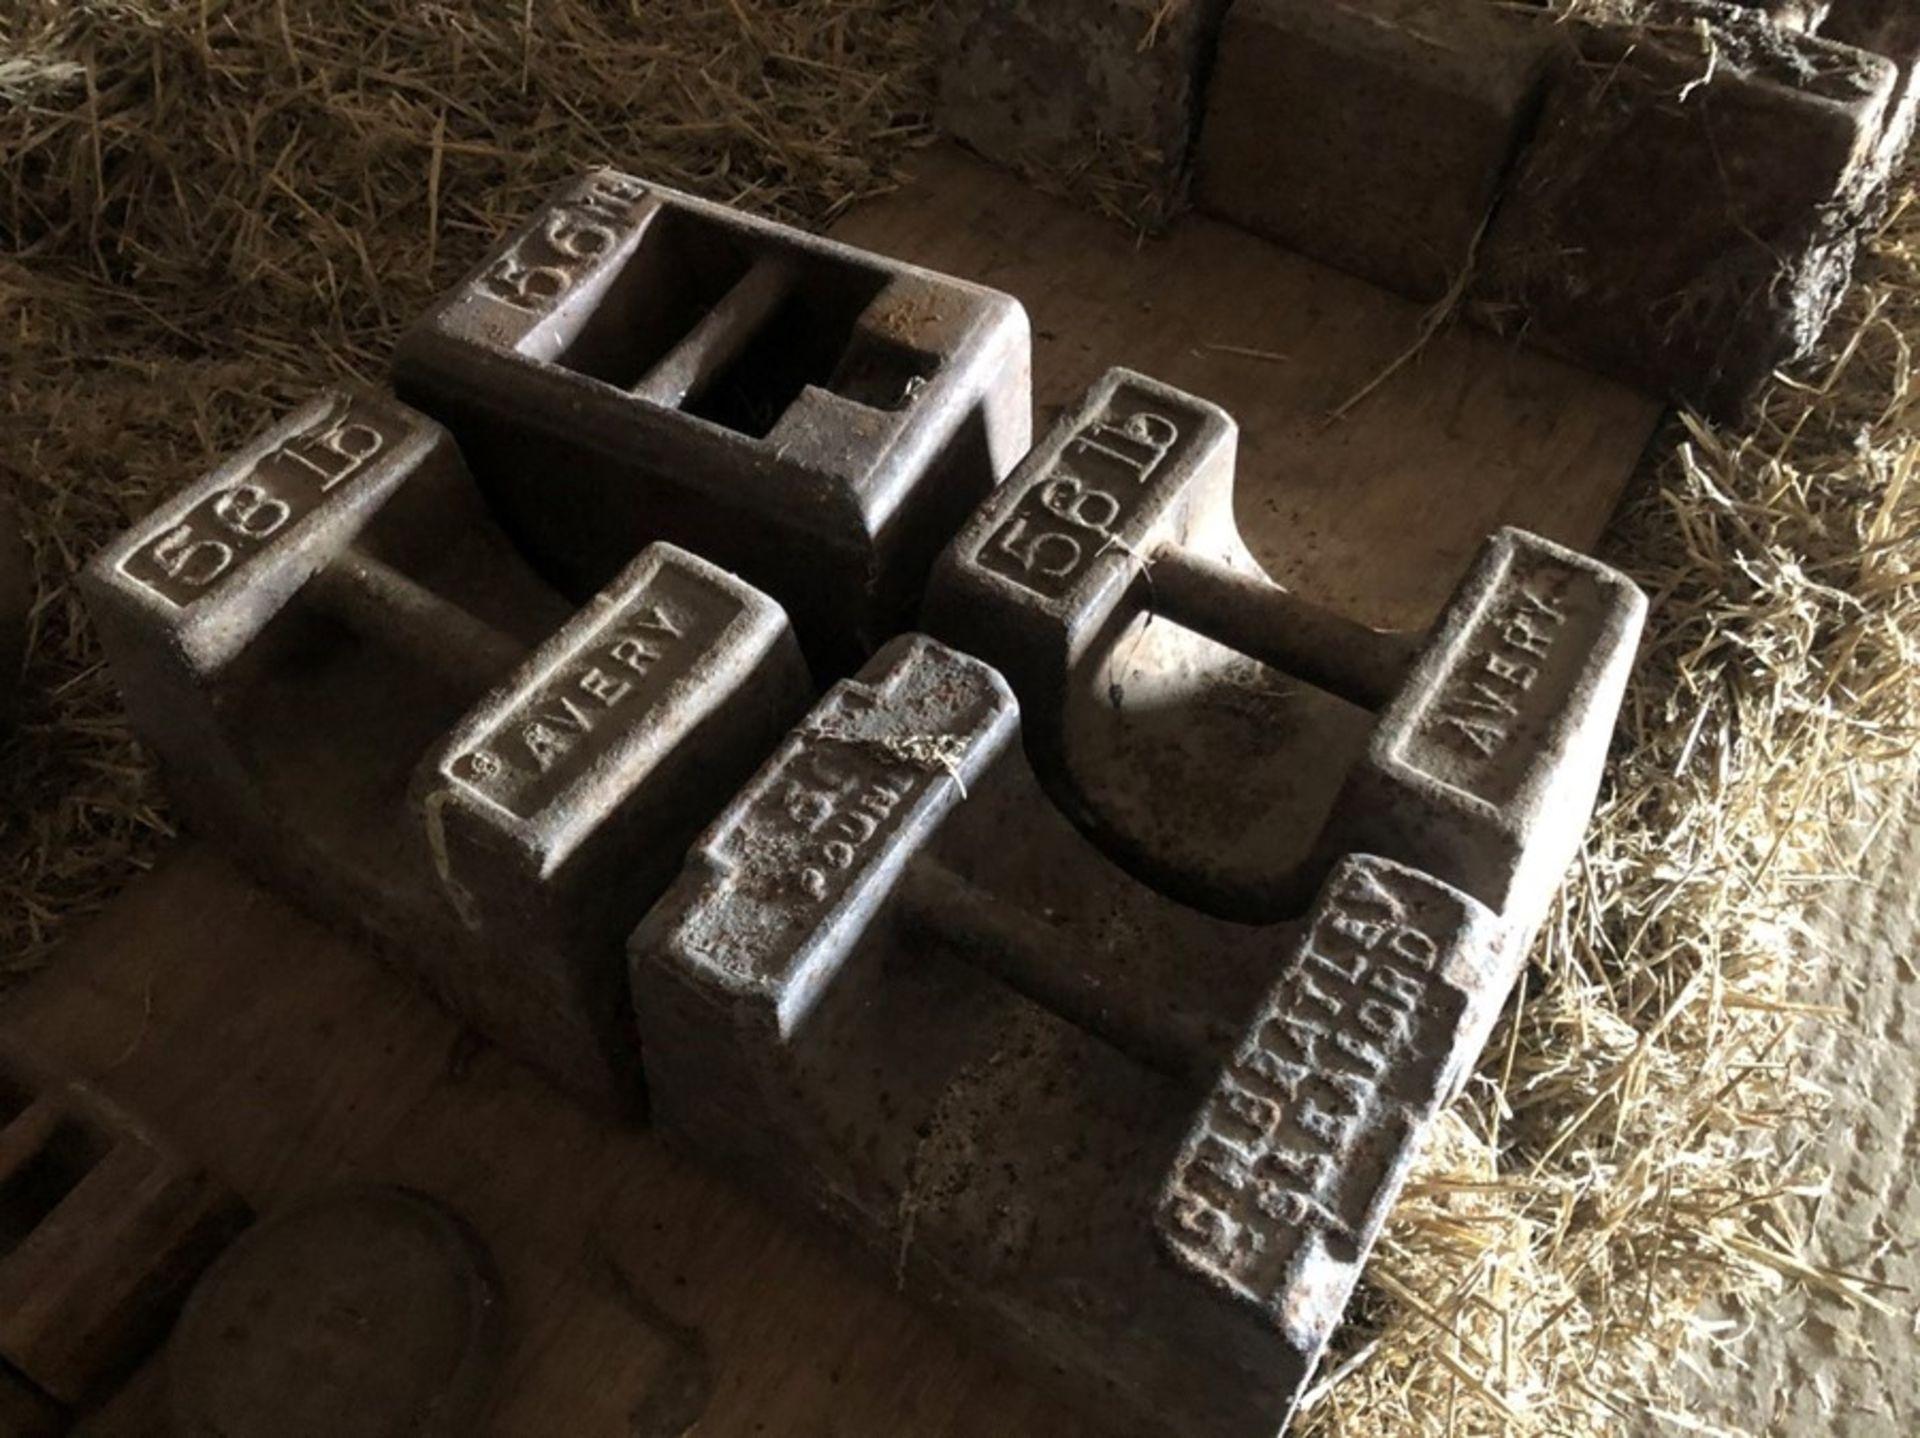 Qty 56lb weights